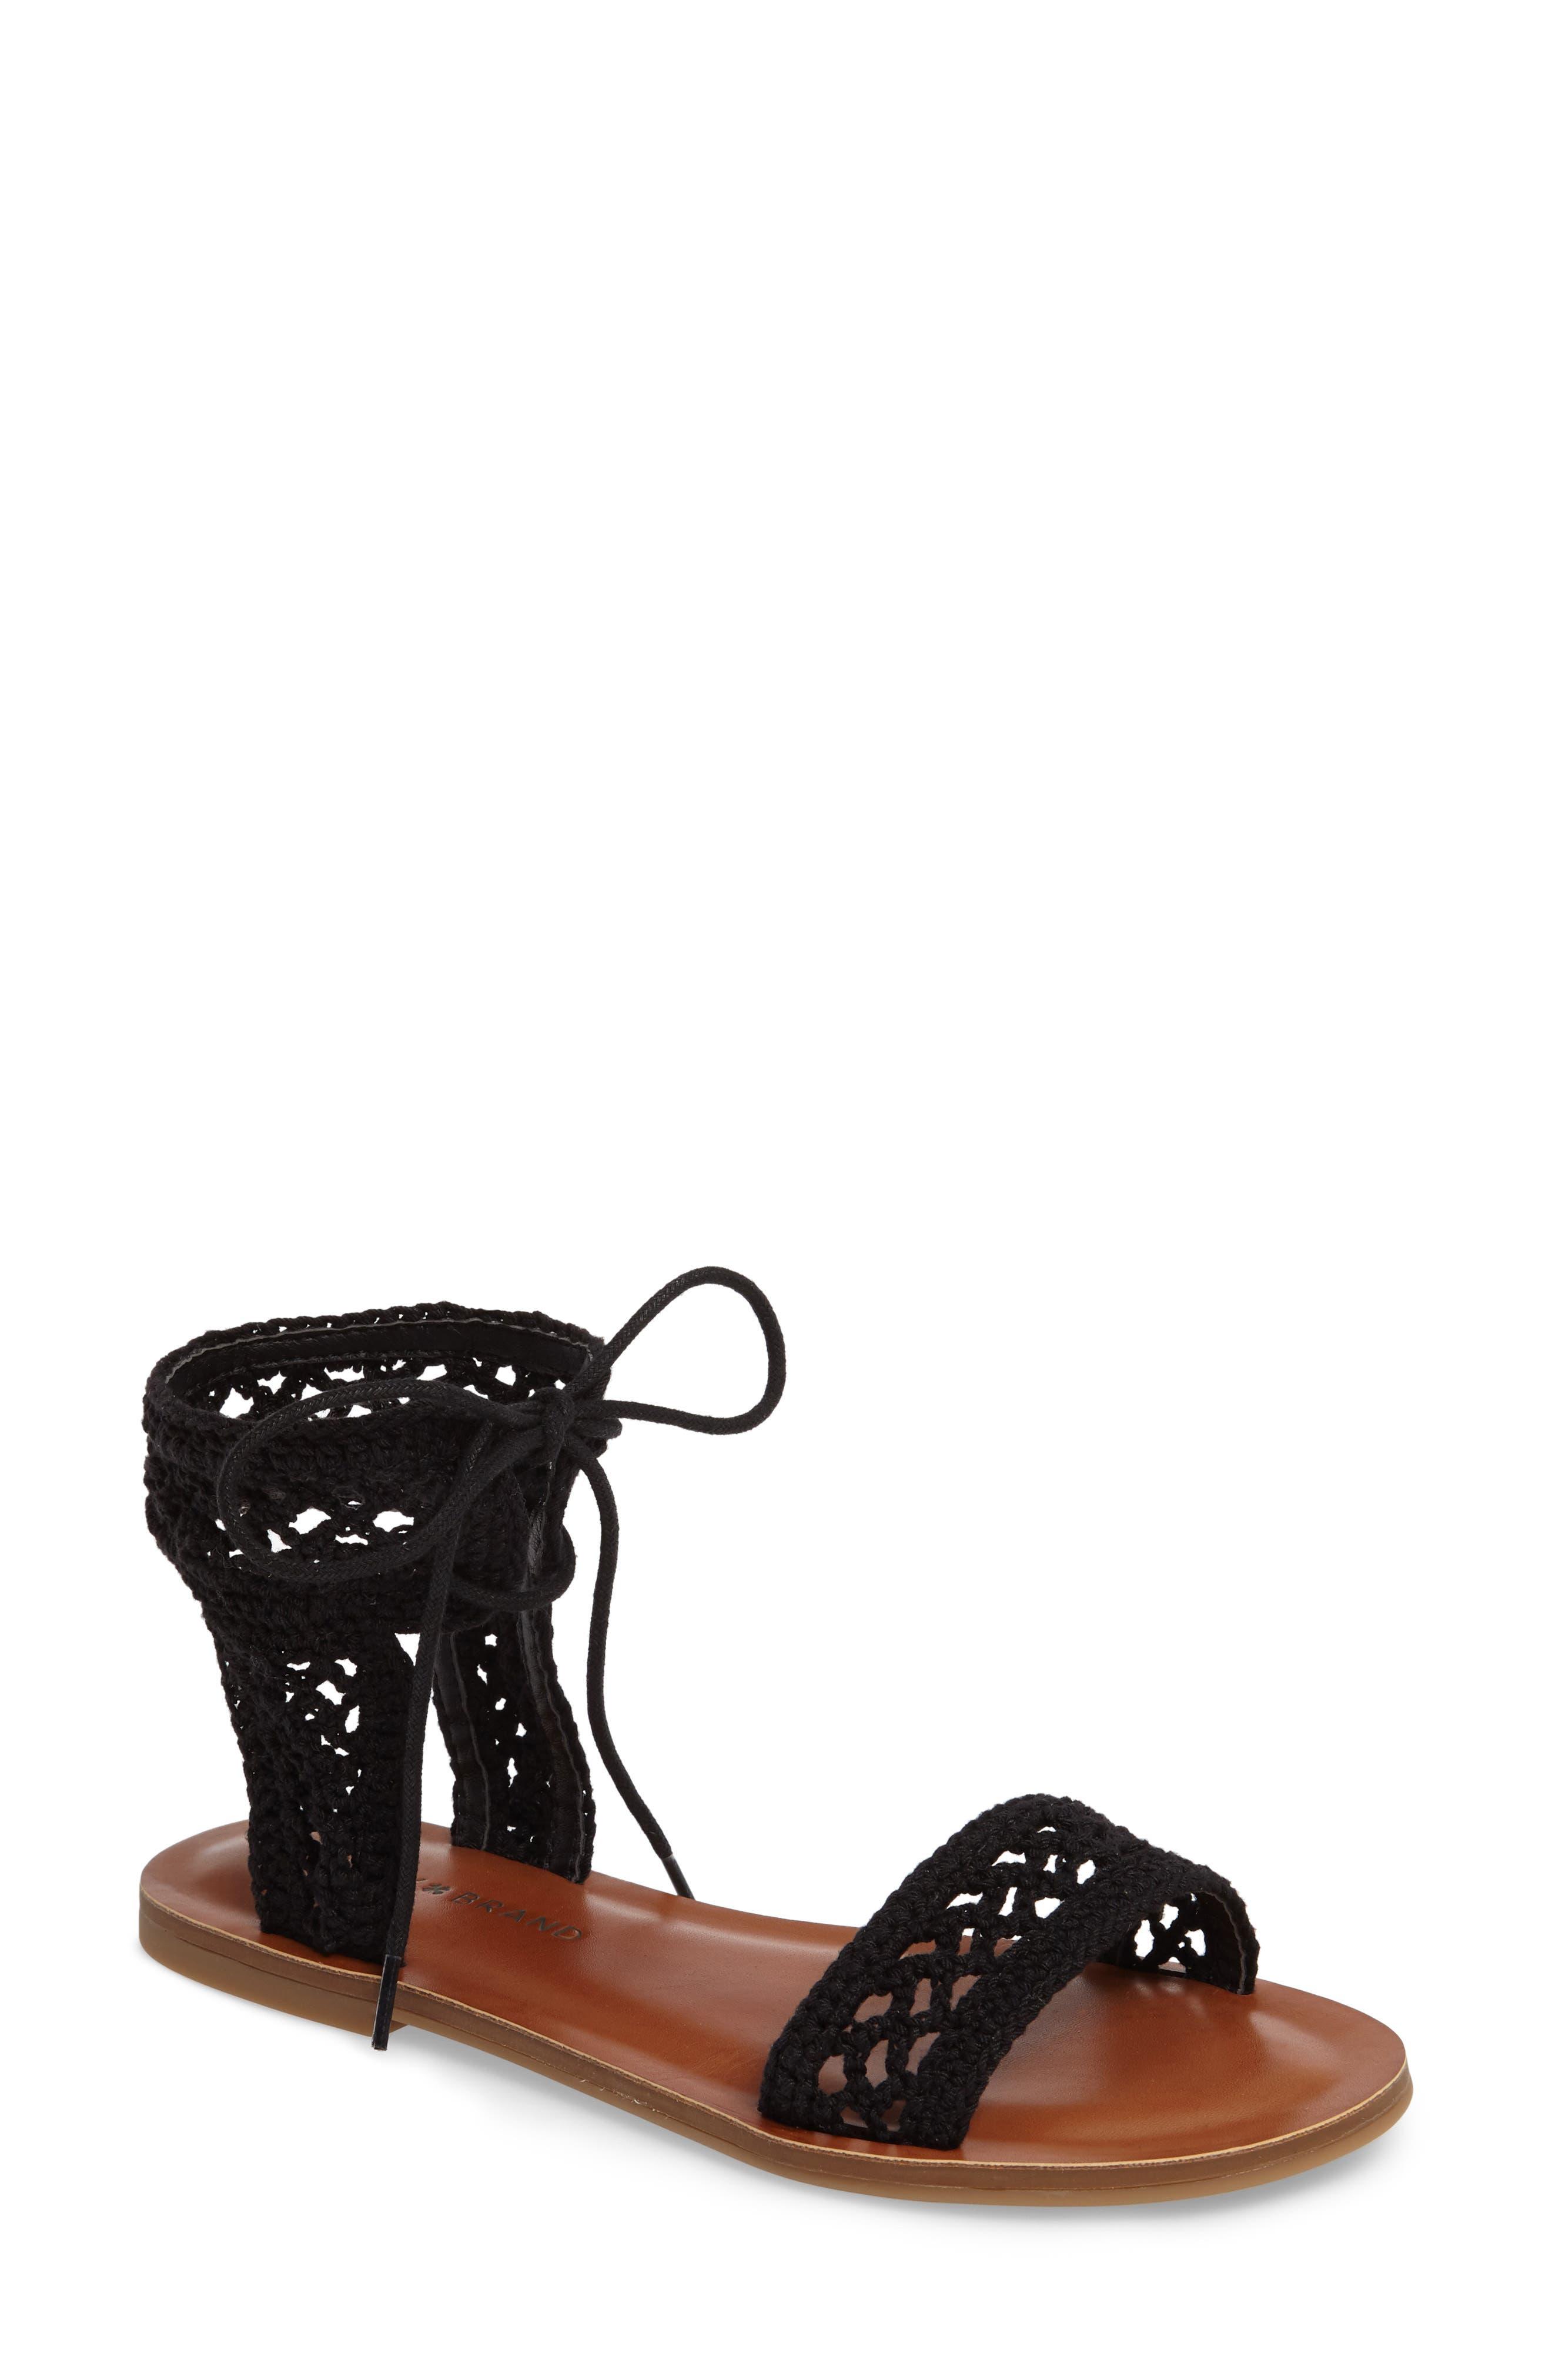 Main Image - Lucky Brand Ariah Ankle Tie Sandal (Women)